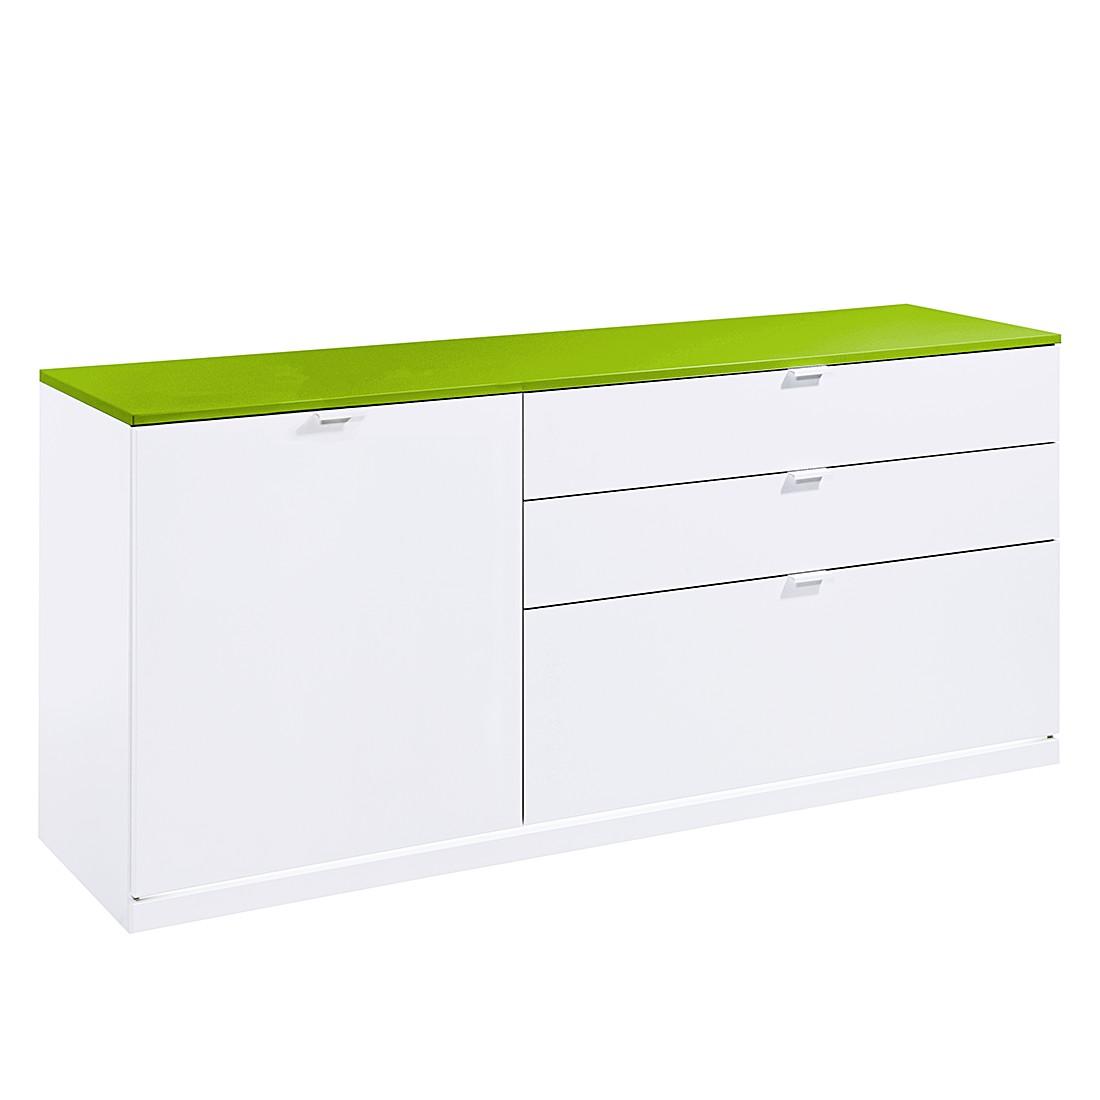 sideboard vip iii wei gr n mit led beleuchtung. Black Bedroom Furniture Sets. Home Design Ideas